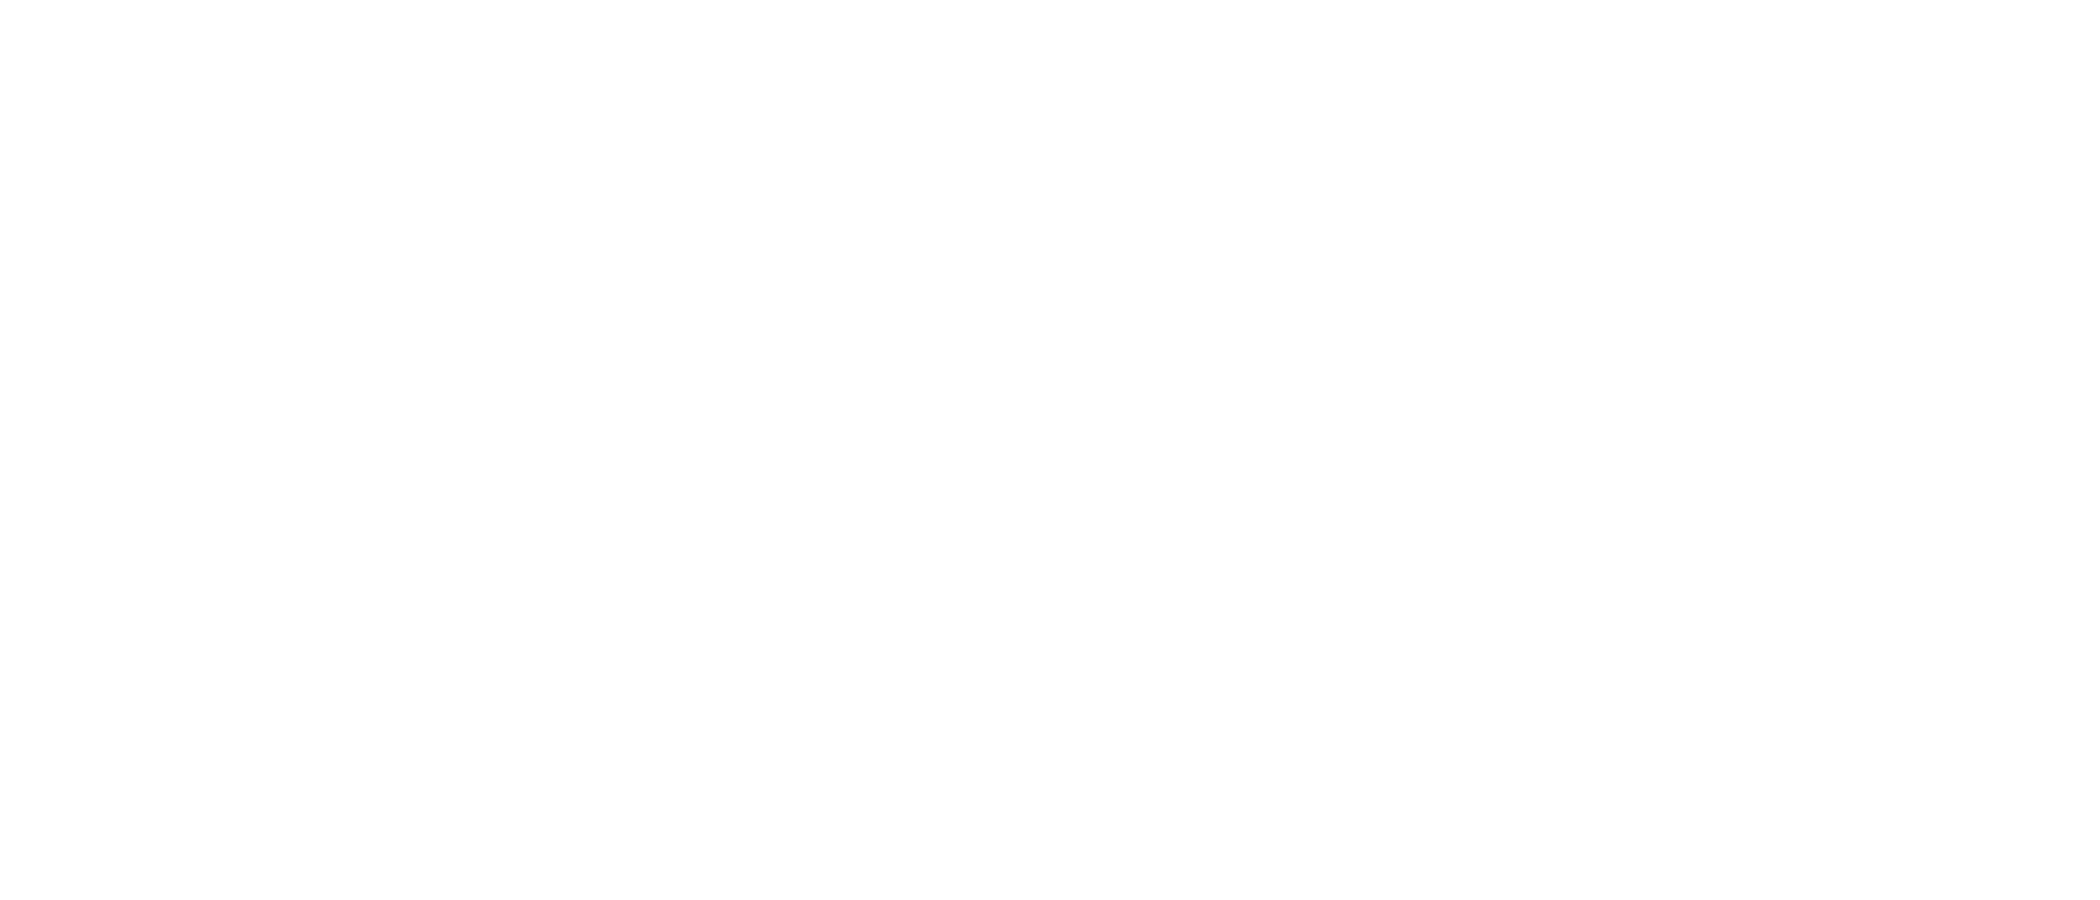 weedmaps logo white